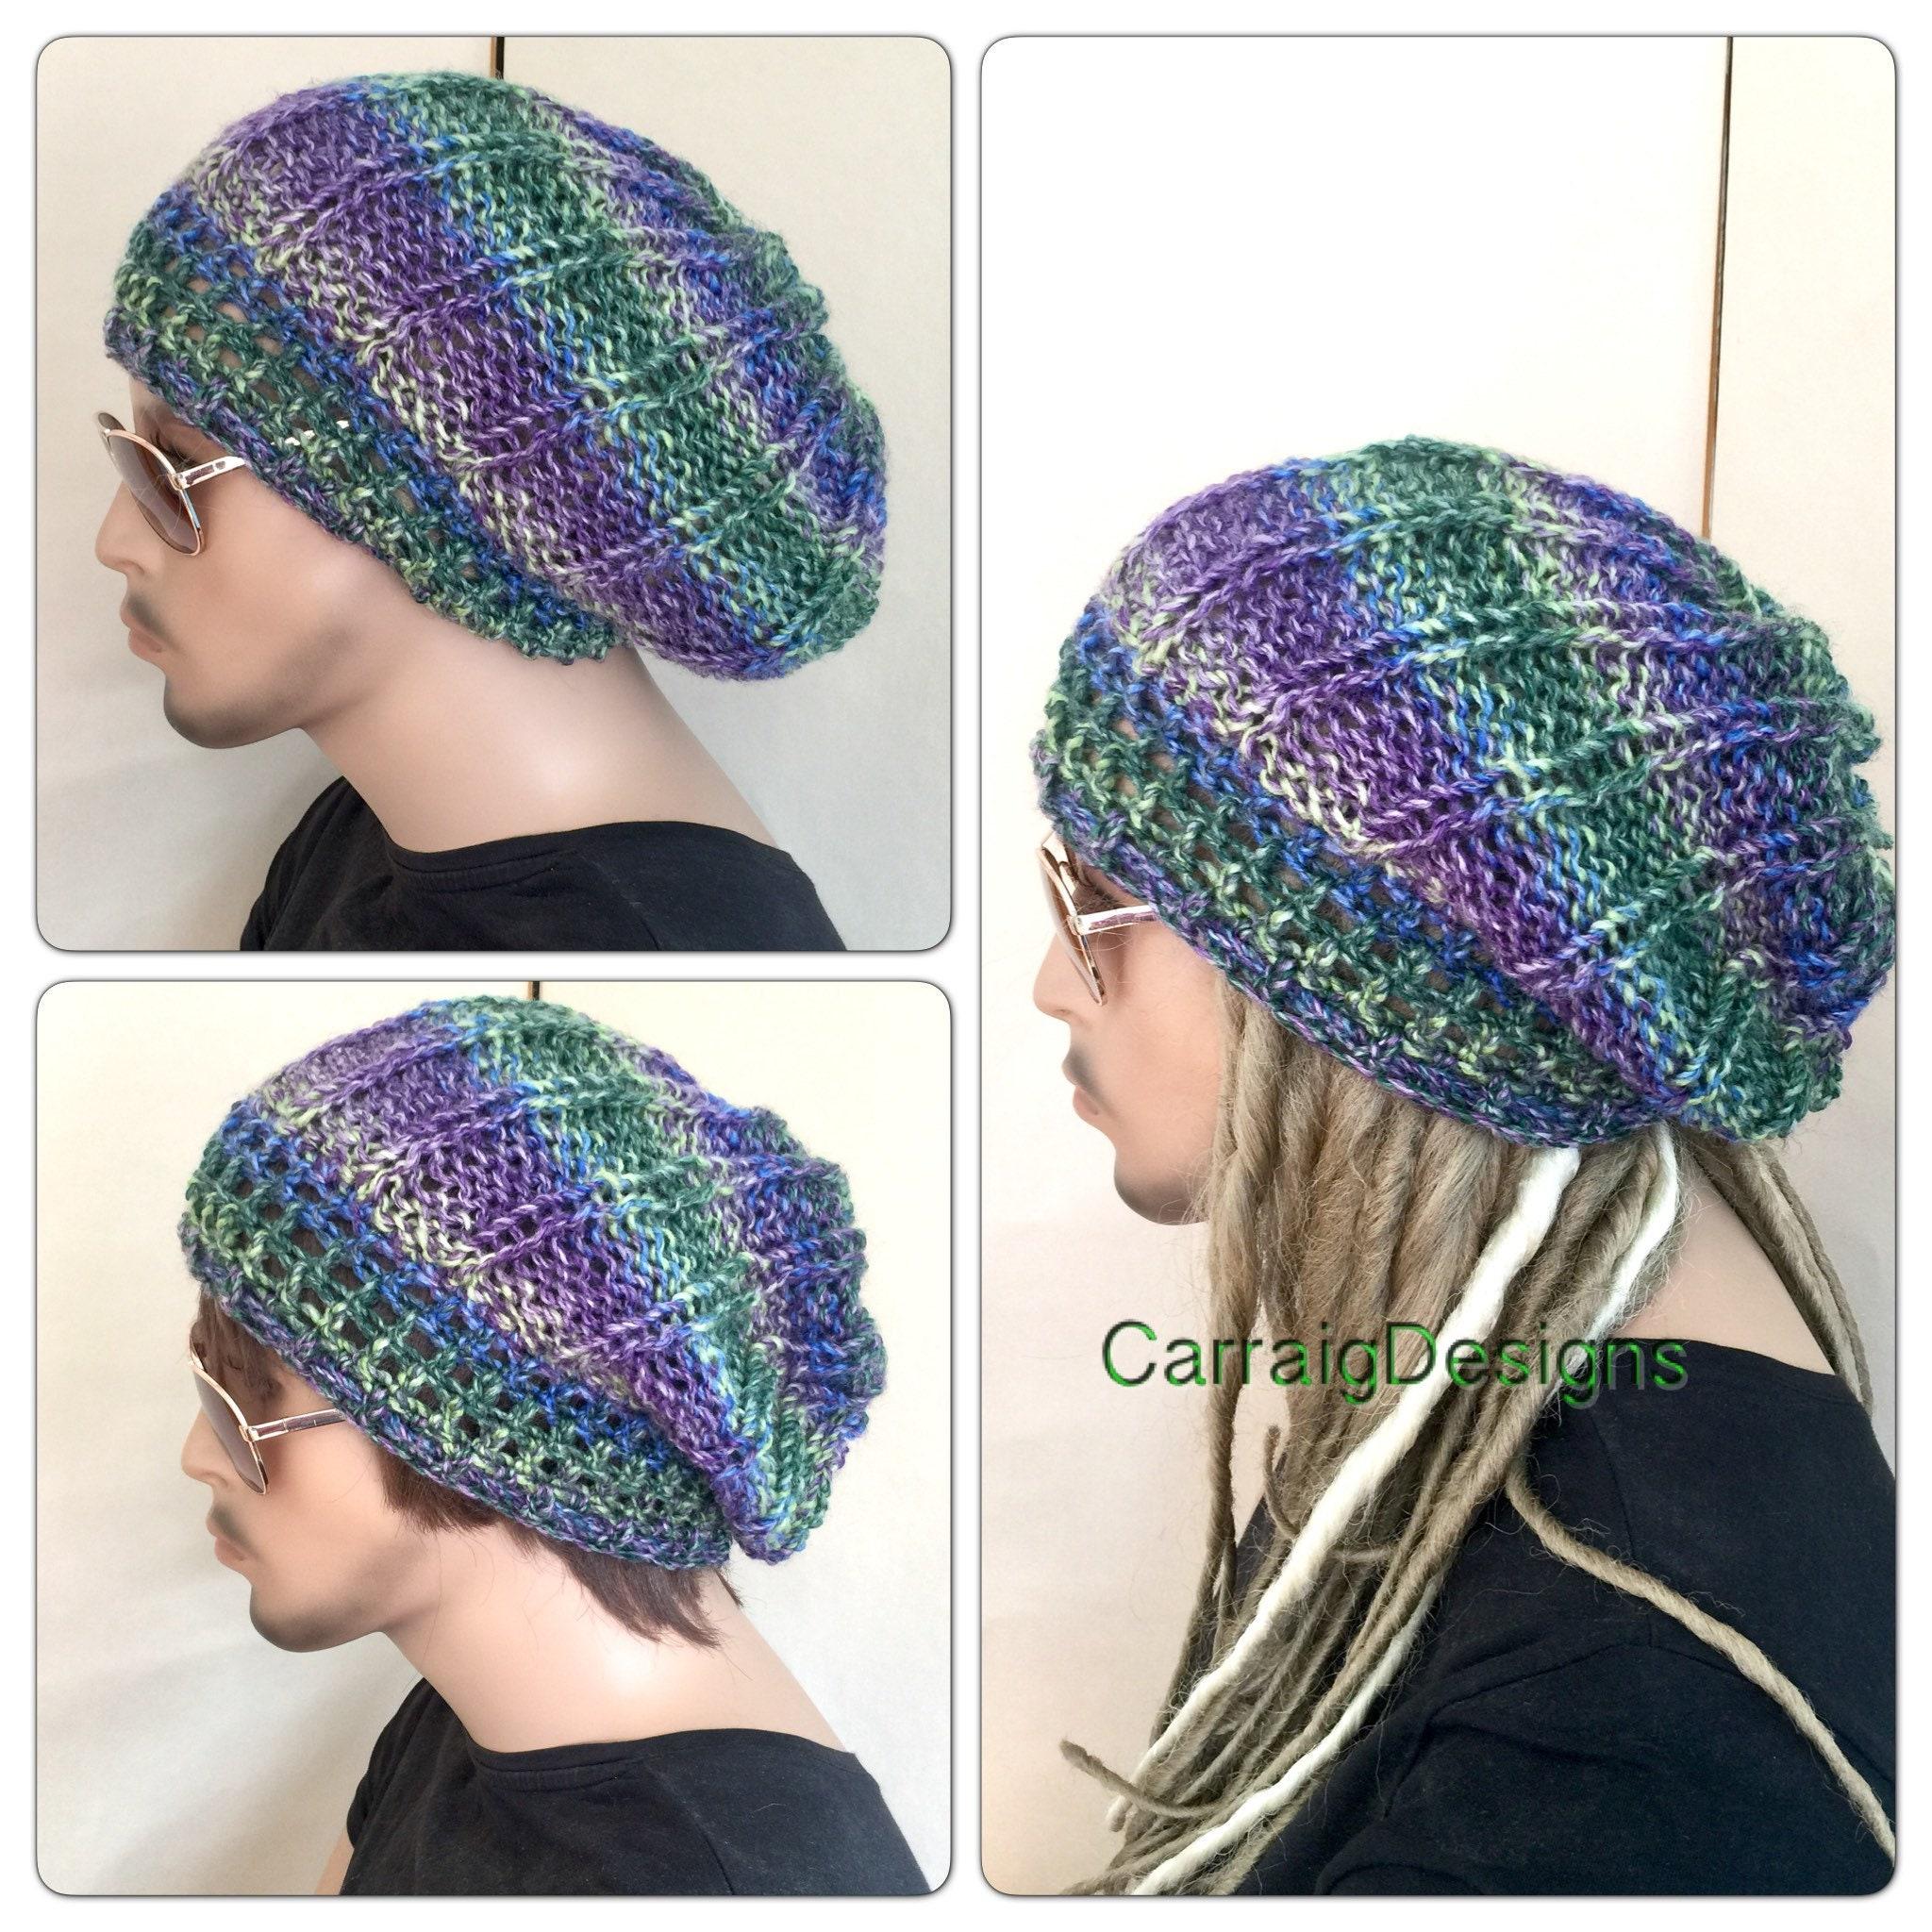 85c675eed99 Unisex slouch Dread beanie Oversized hat mans mens unisex guy hand crochet  knit gift tam accessories hippy handmade dreadlocks irish ooak